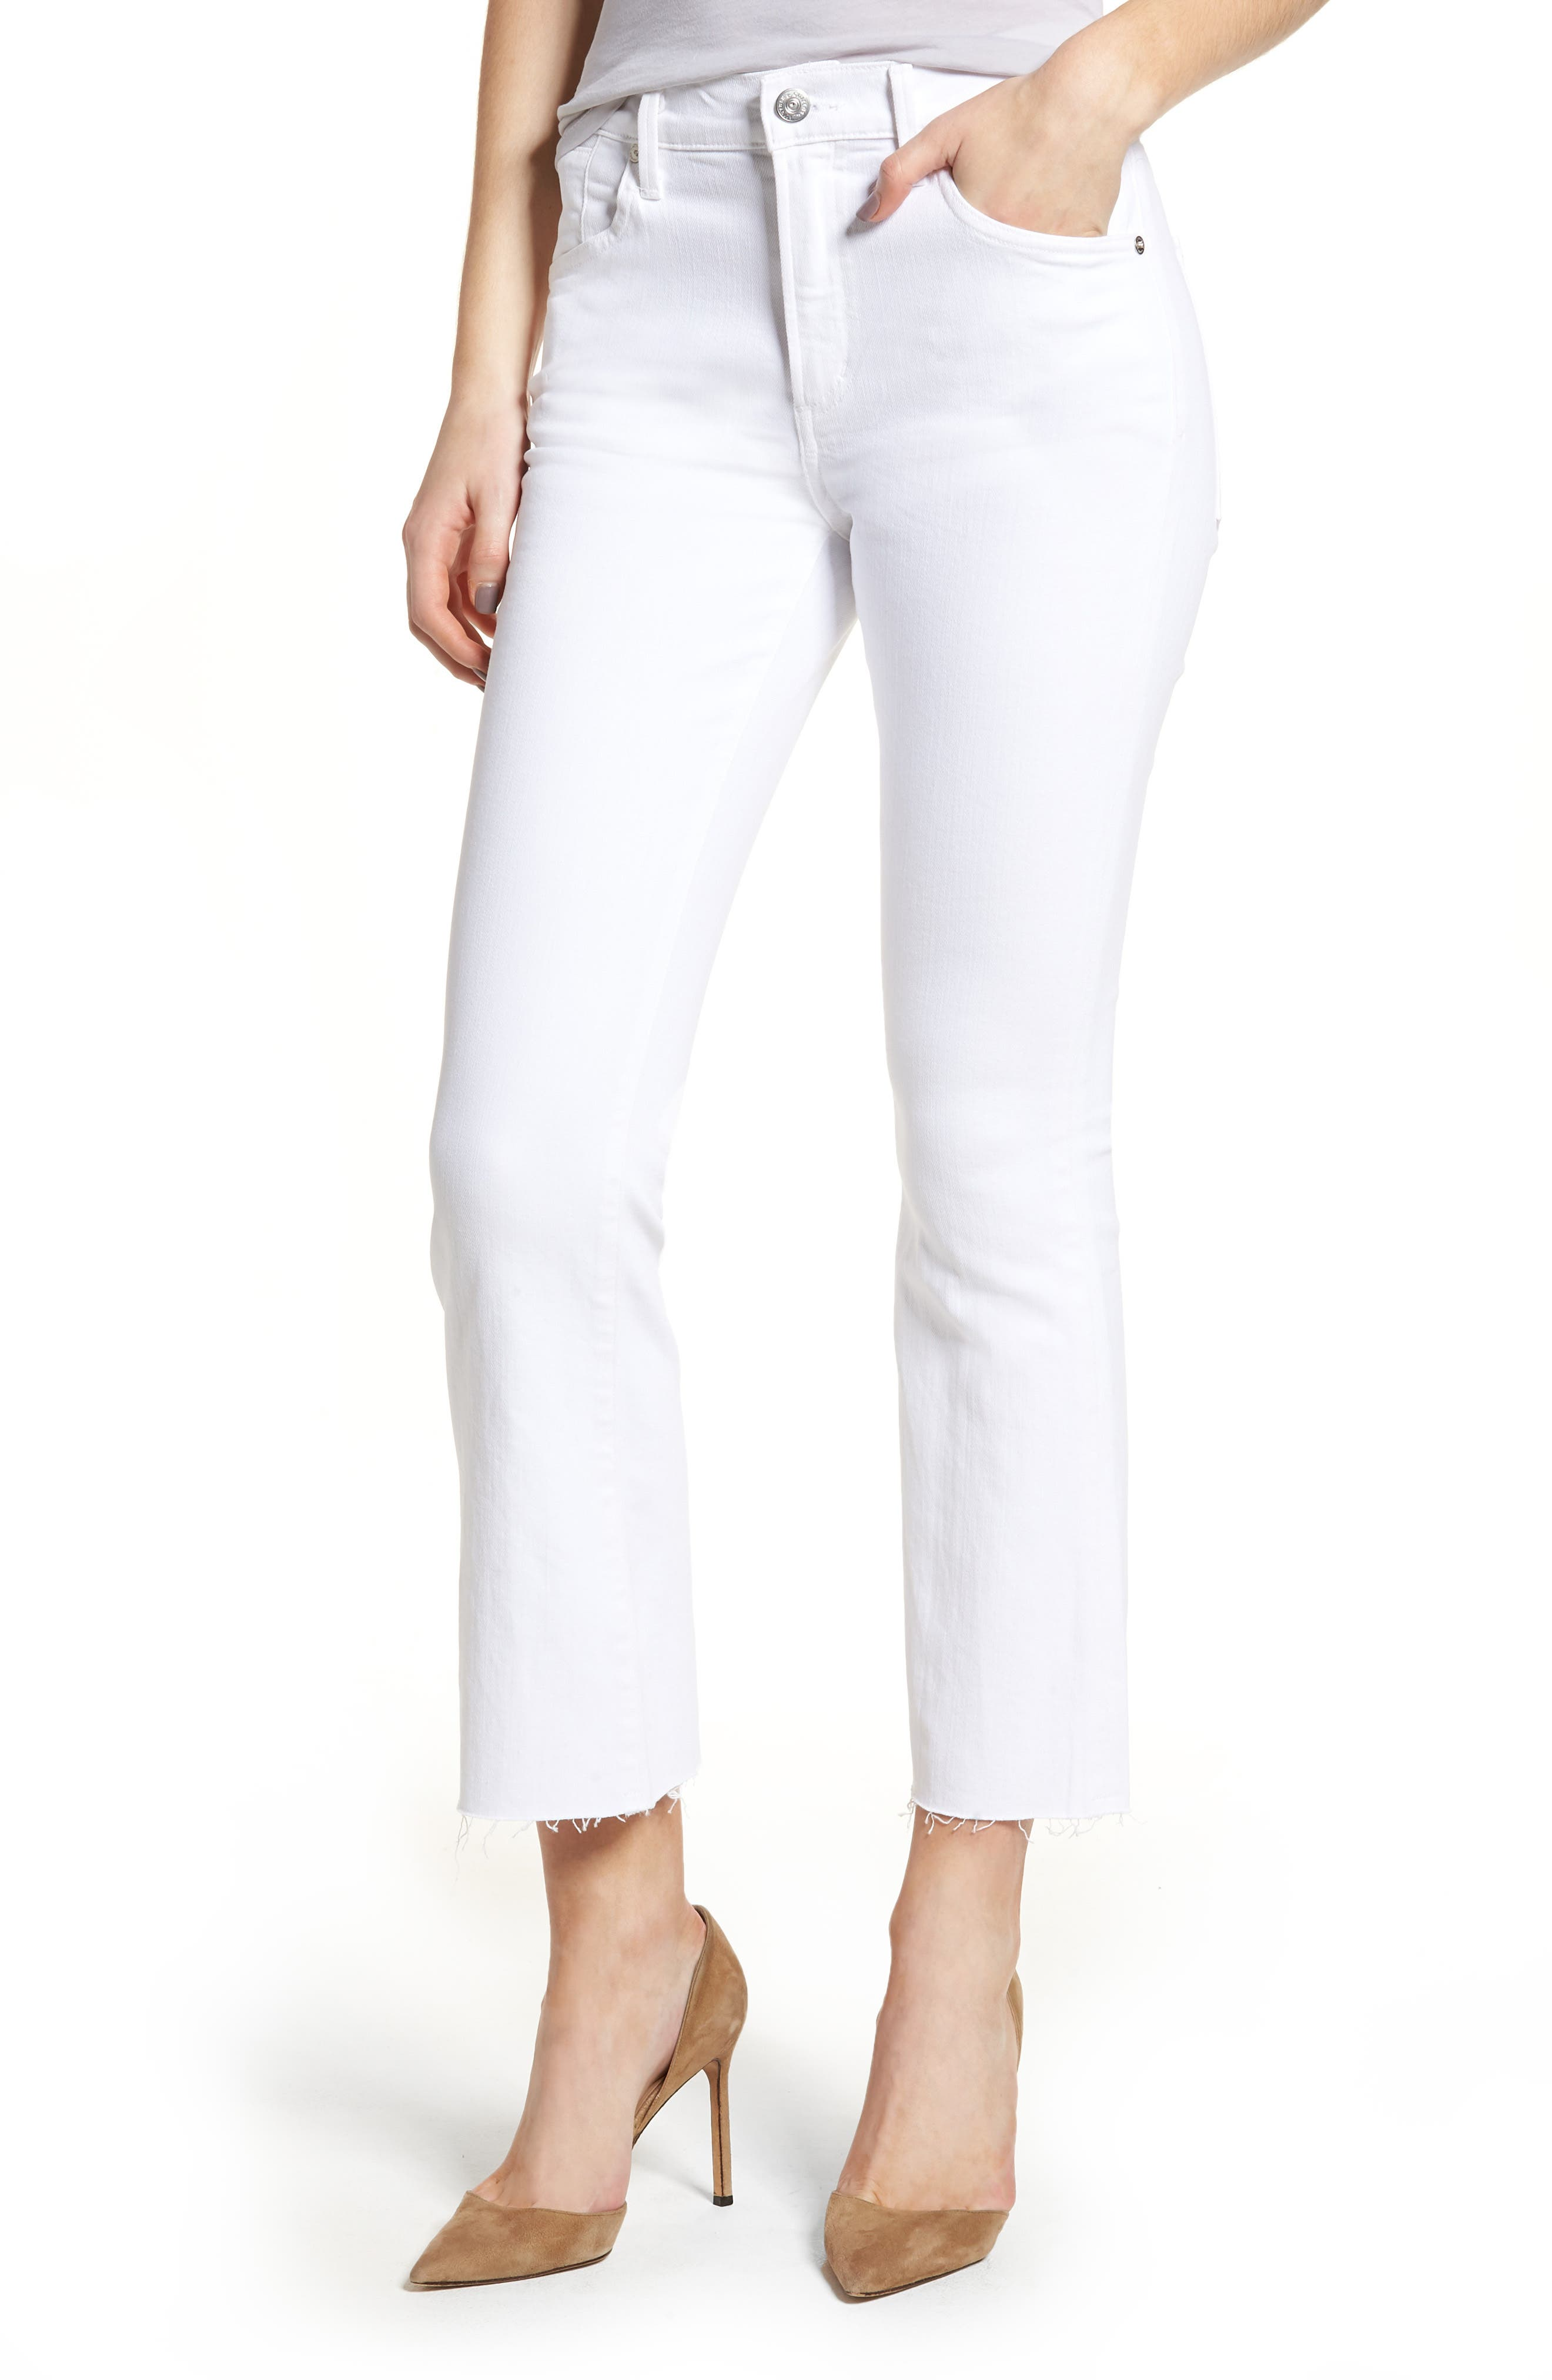 Fleetwood Crop Straight Leg Jeans,                             Main thumbnail 1, color,                             Optic White